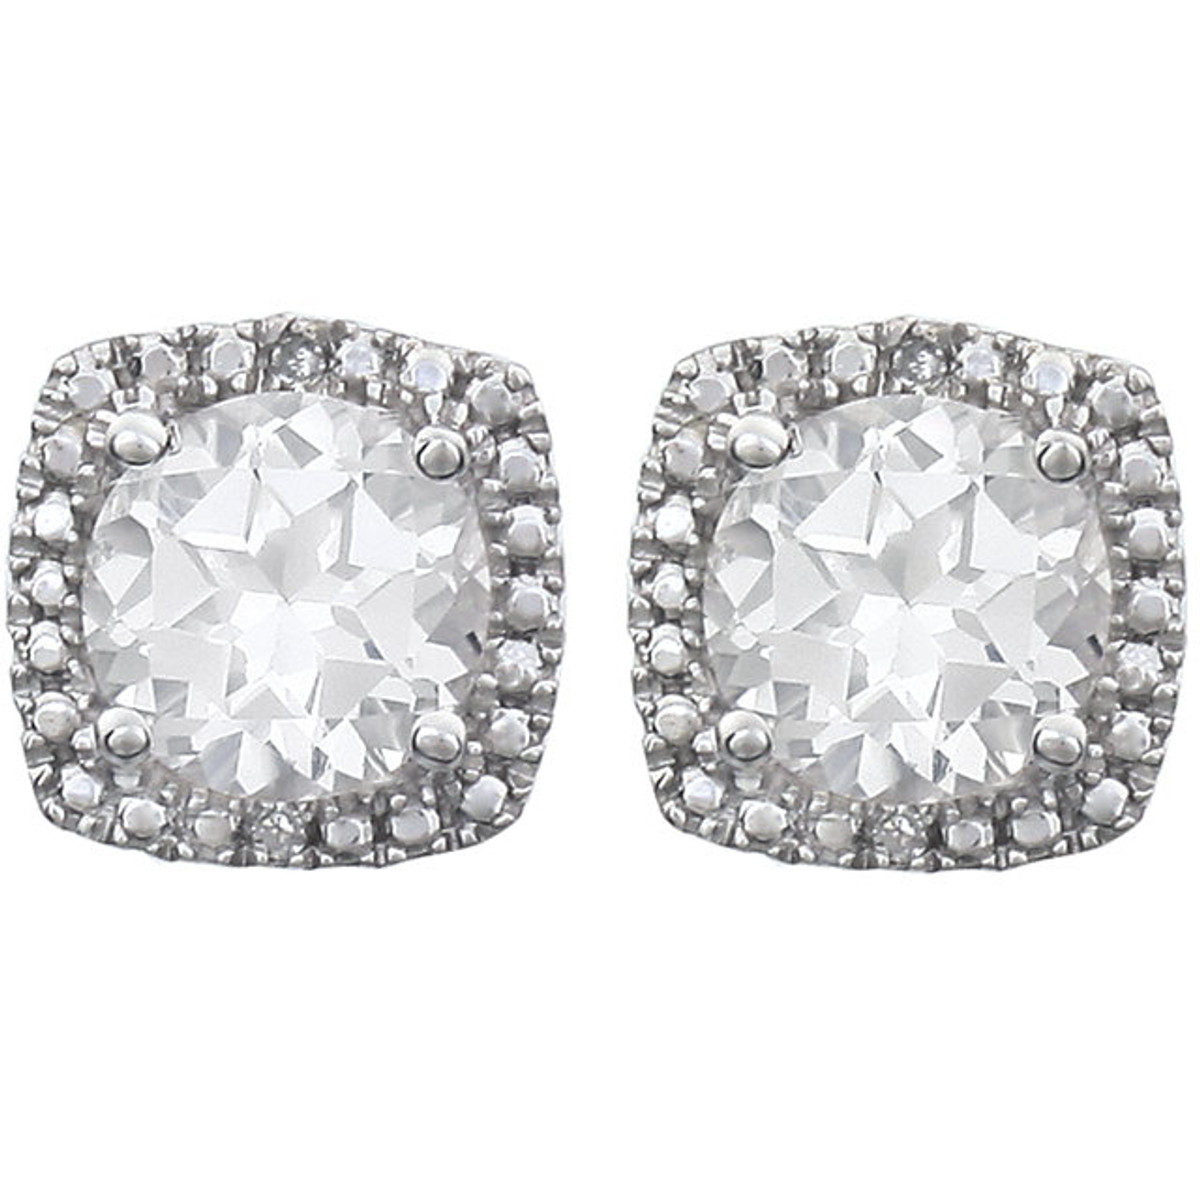 White Sapphire & Diamond Earrings